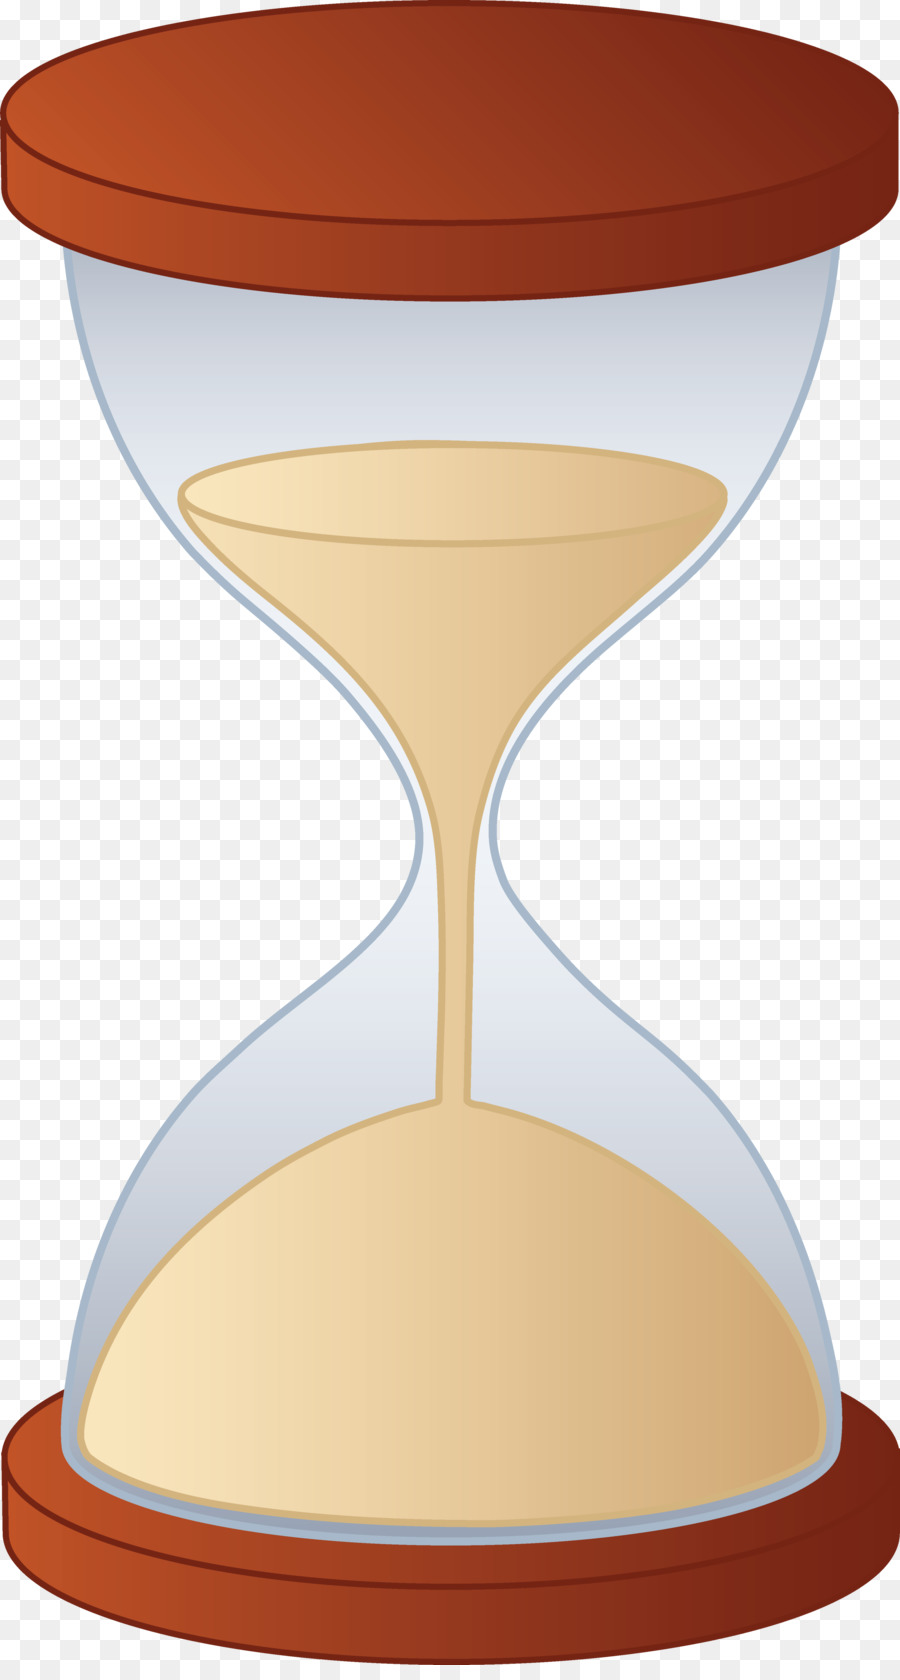 Egg timer clip art. Hourglass clipart